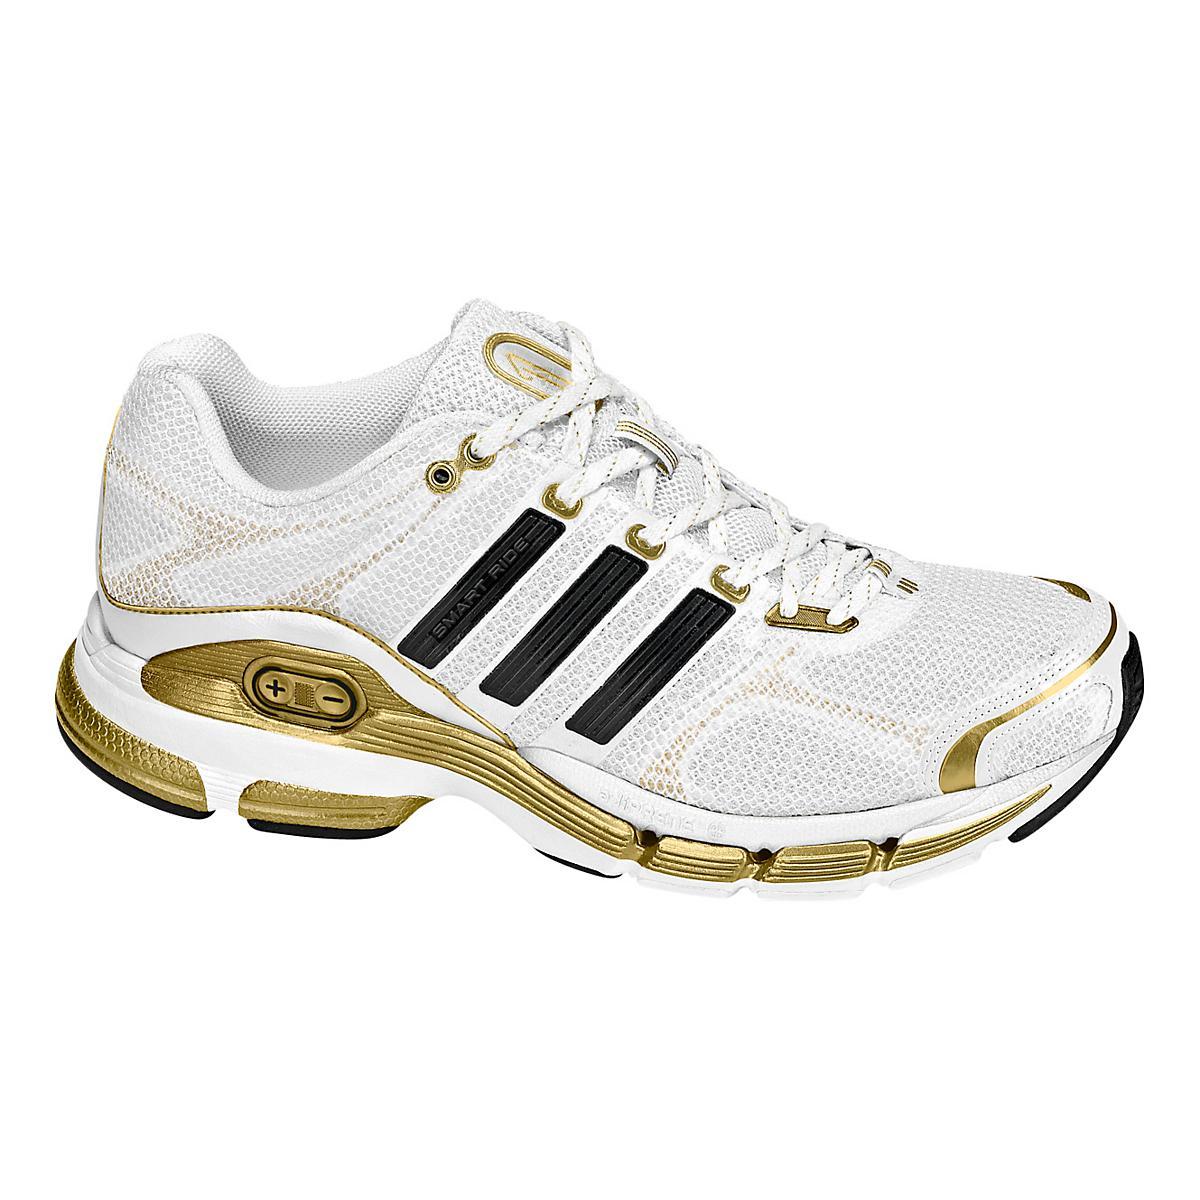 adidas 1 running shoe